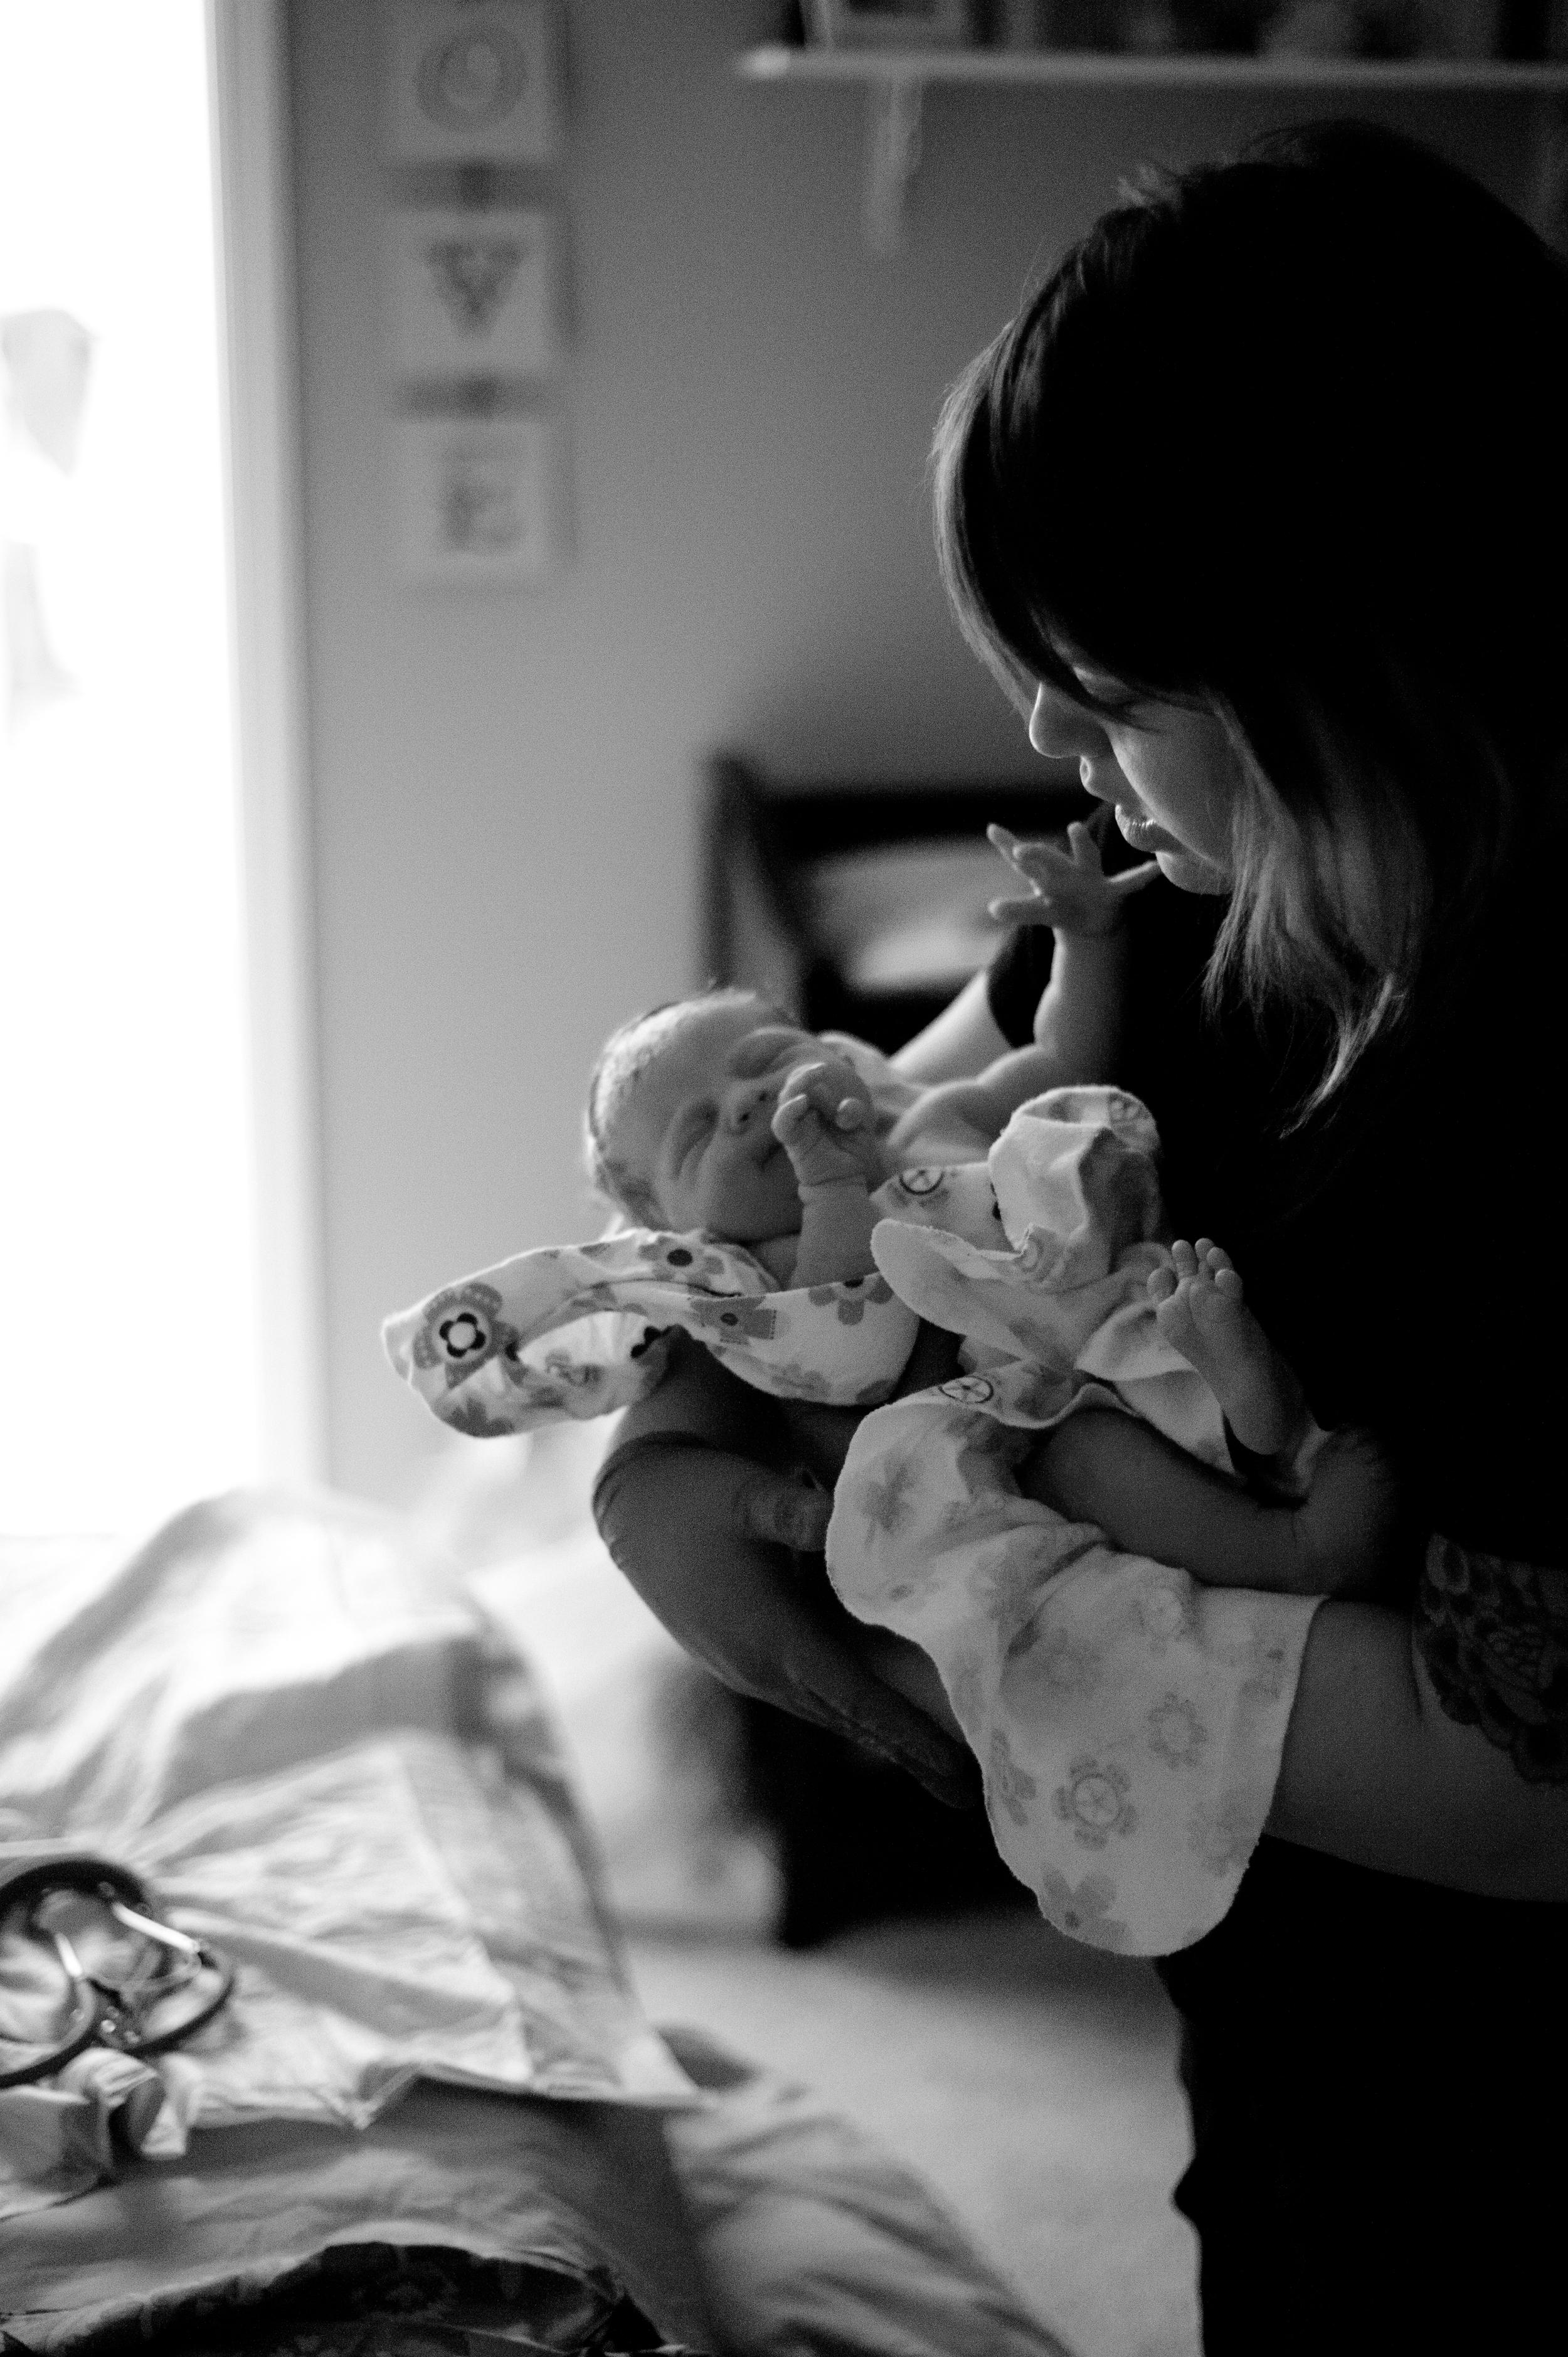 homebirth, florida homebirth, home birth, brandon home birth, st pete home birth, tampa vbac, Tampa Bay Birth Network, TBBN, Natural Birth and Baby Expo, Tampa VBAC options, Barefoot Birth, Improving Birth tampa , childbirth education tampa, childbirth ed tampa, lamaze tampa, hypnobirthing tampa, birth boot camp tampa, birth classes tampa, tampa Birth Photographer, Midwife, Florida Midwife, Tampa Midwife, Brandon Midwife, Tampa Newborn photography, tampa maternity photography, brandon photography, brandon newborn photography, breastfeeding, tampa breastfeeding, tampa placenta encapsulation, tampa homebirth, homebirth, brandon home birth, brandon homebirth, tampa home birth, st pete homebirth, st pete home birth, tampa birth center, st pete birth center, prenatal massage tampa, tampa massage therapist, tampa craniosacral therapy, tampa doula, brandon doula, brandon postpartum doula, tampa full spectrum support, the fourth trimester, breastfeeding support tampa, breastfeeding support clearwater, breastfeeding support st pete, birth center tampa fl, birth center brandon fl, birth center st pete fl, birth center clearwater fl, interviewing a midwife, midwife questions, questions for a midwife, interviewing a birth center